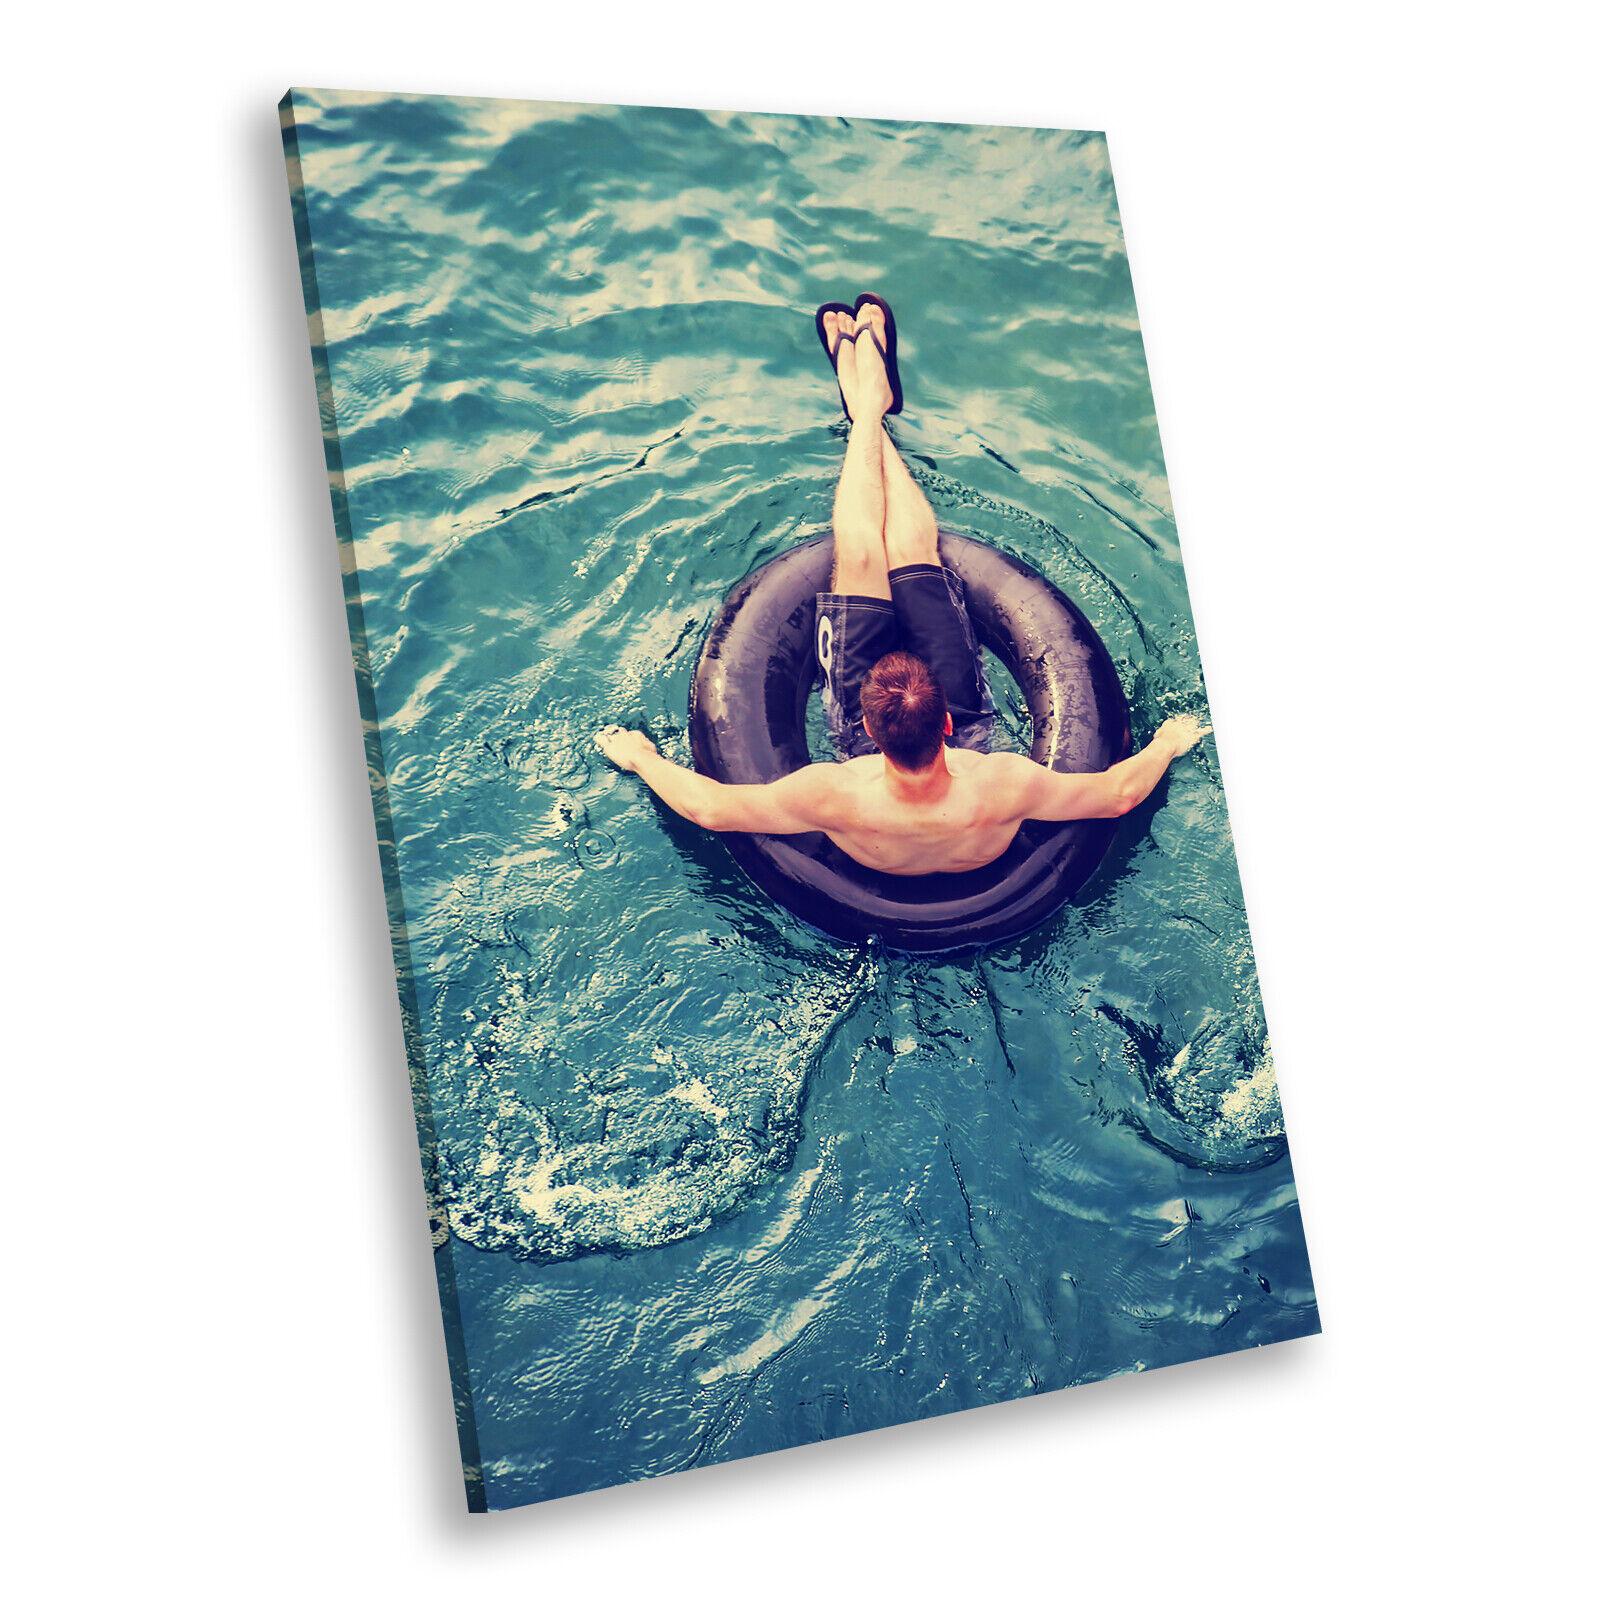 Blau Retro Ocean Relaxing Portrait Scenic Canvas Wall Art Large Picture Prints